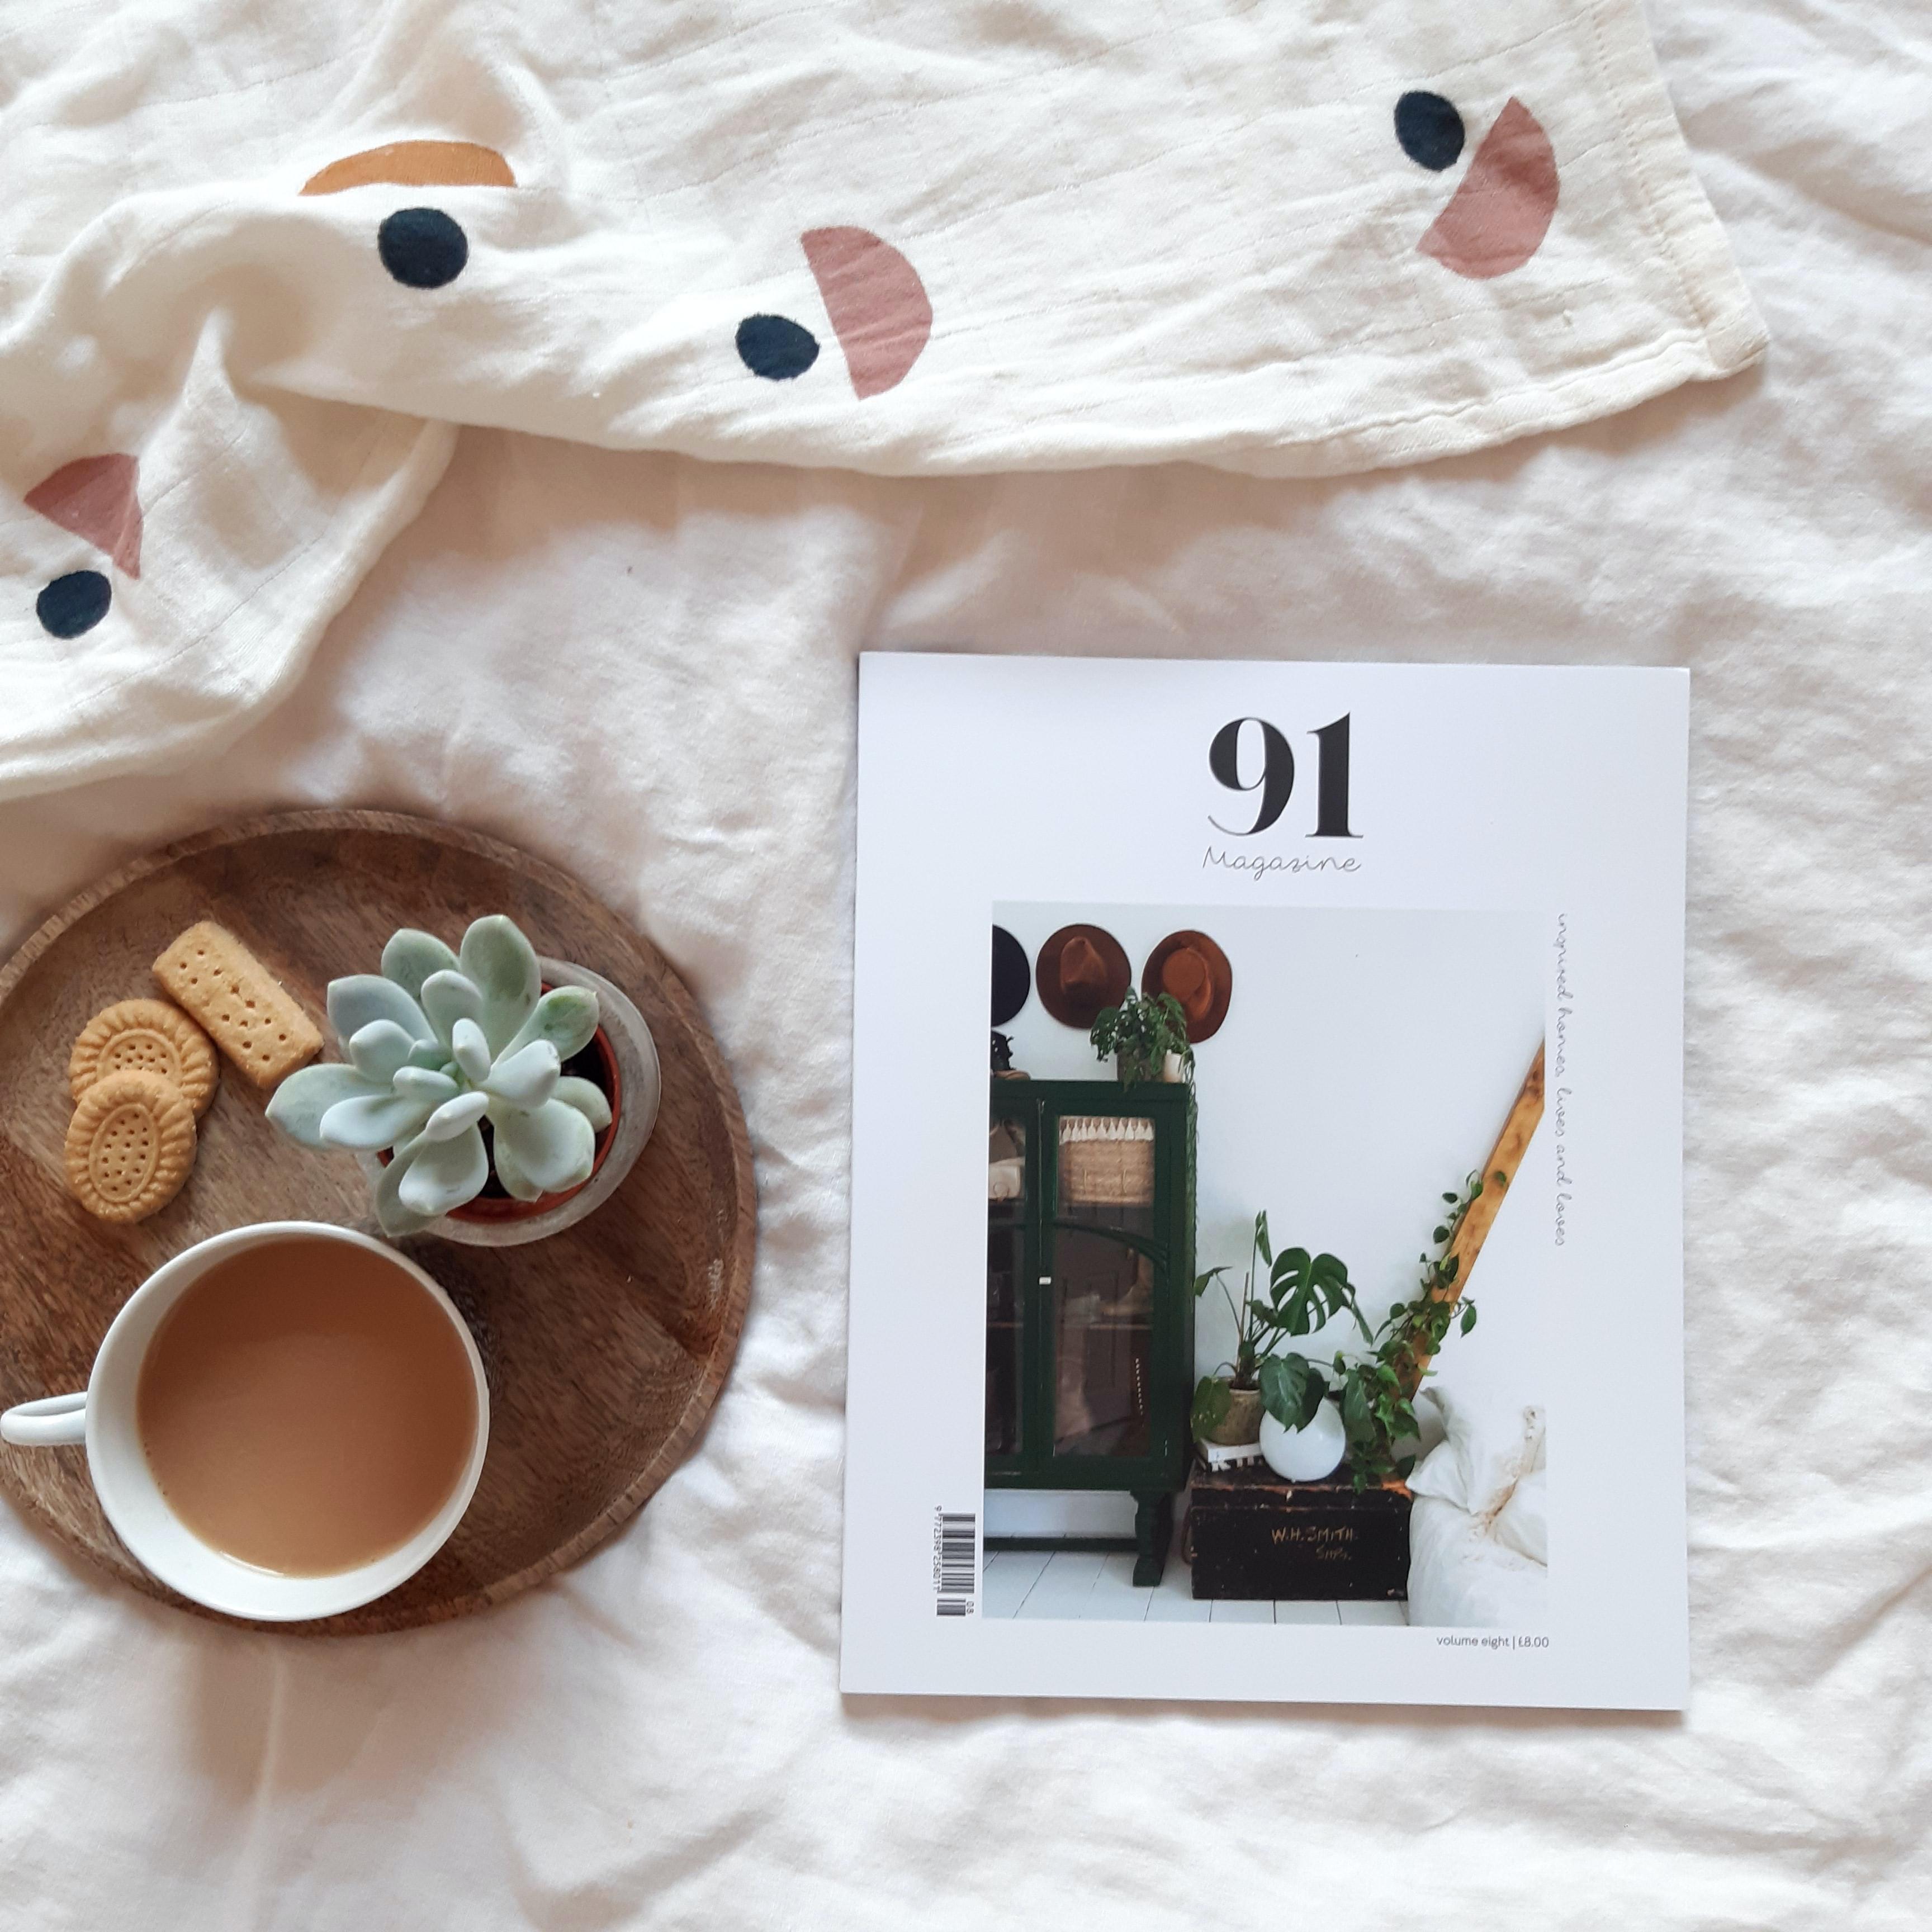 91-magazine-DZLgLLRG-Lg-unsplash